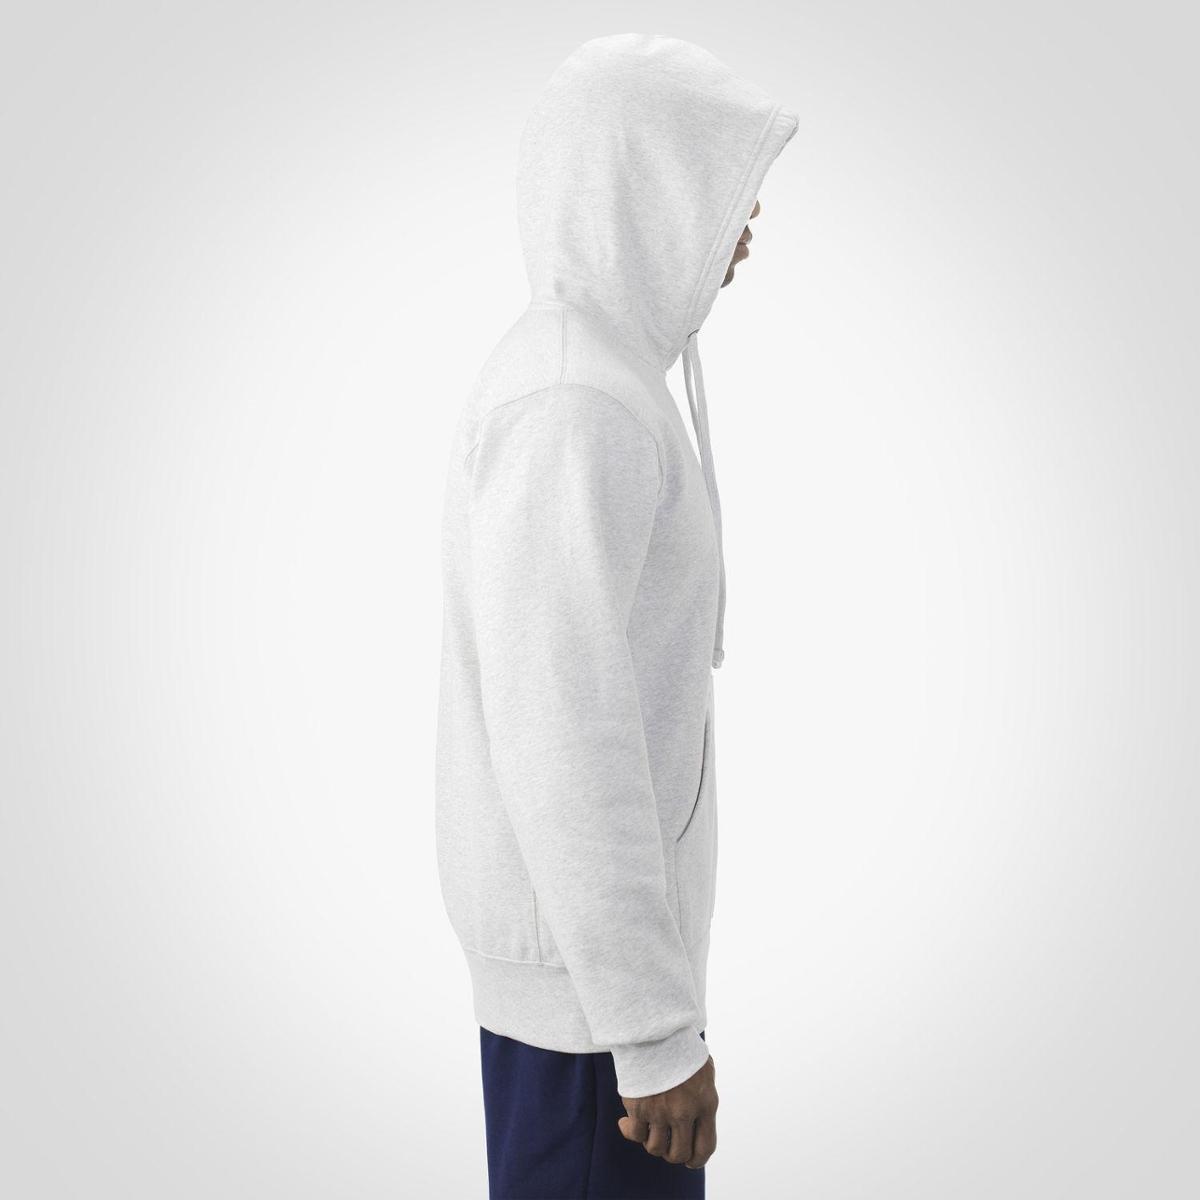 6c9b2b76f3 Moletom Polo Blu Canguru Masculino - Branco - Compre Agora